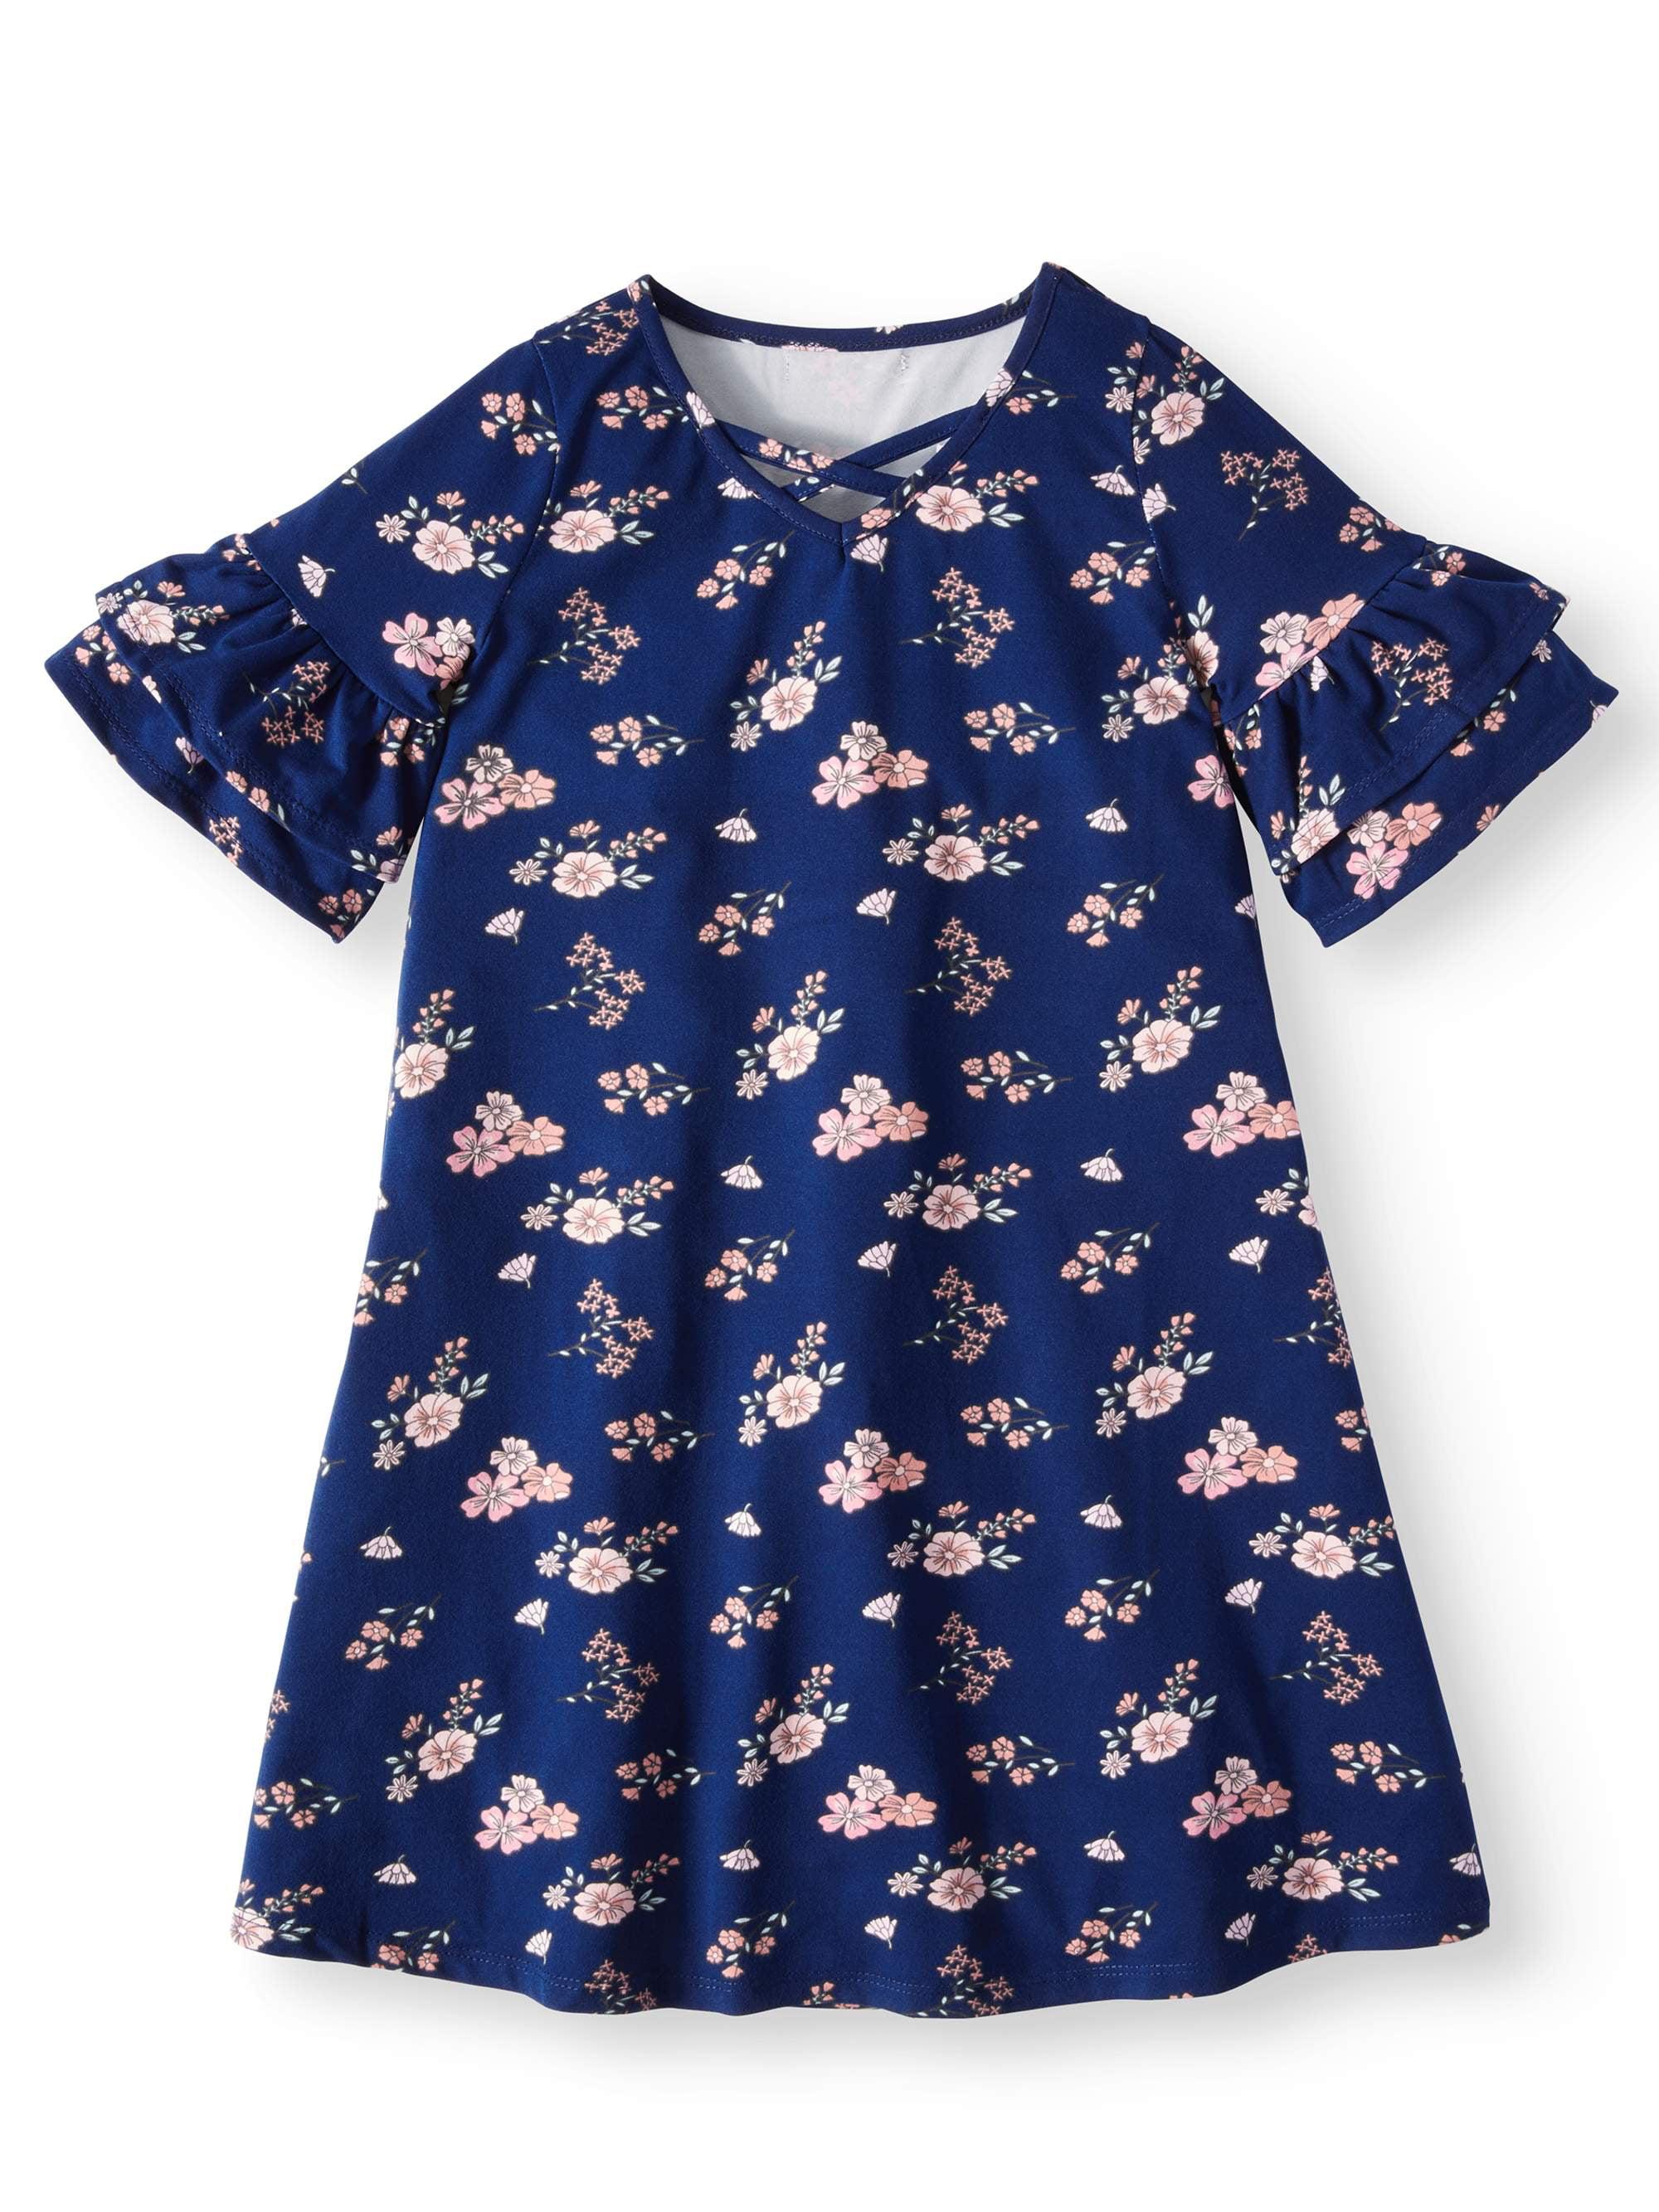 Cross Neck Ruffled Sleeve Floral Dress (Big Girls)